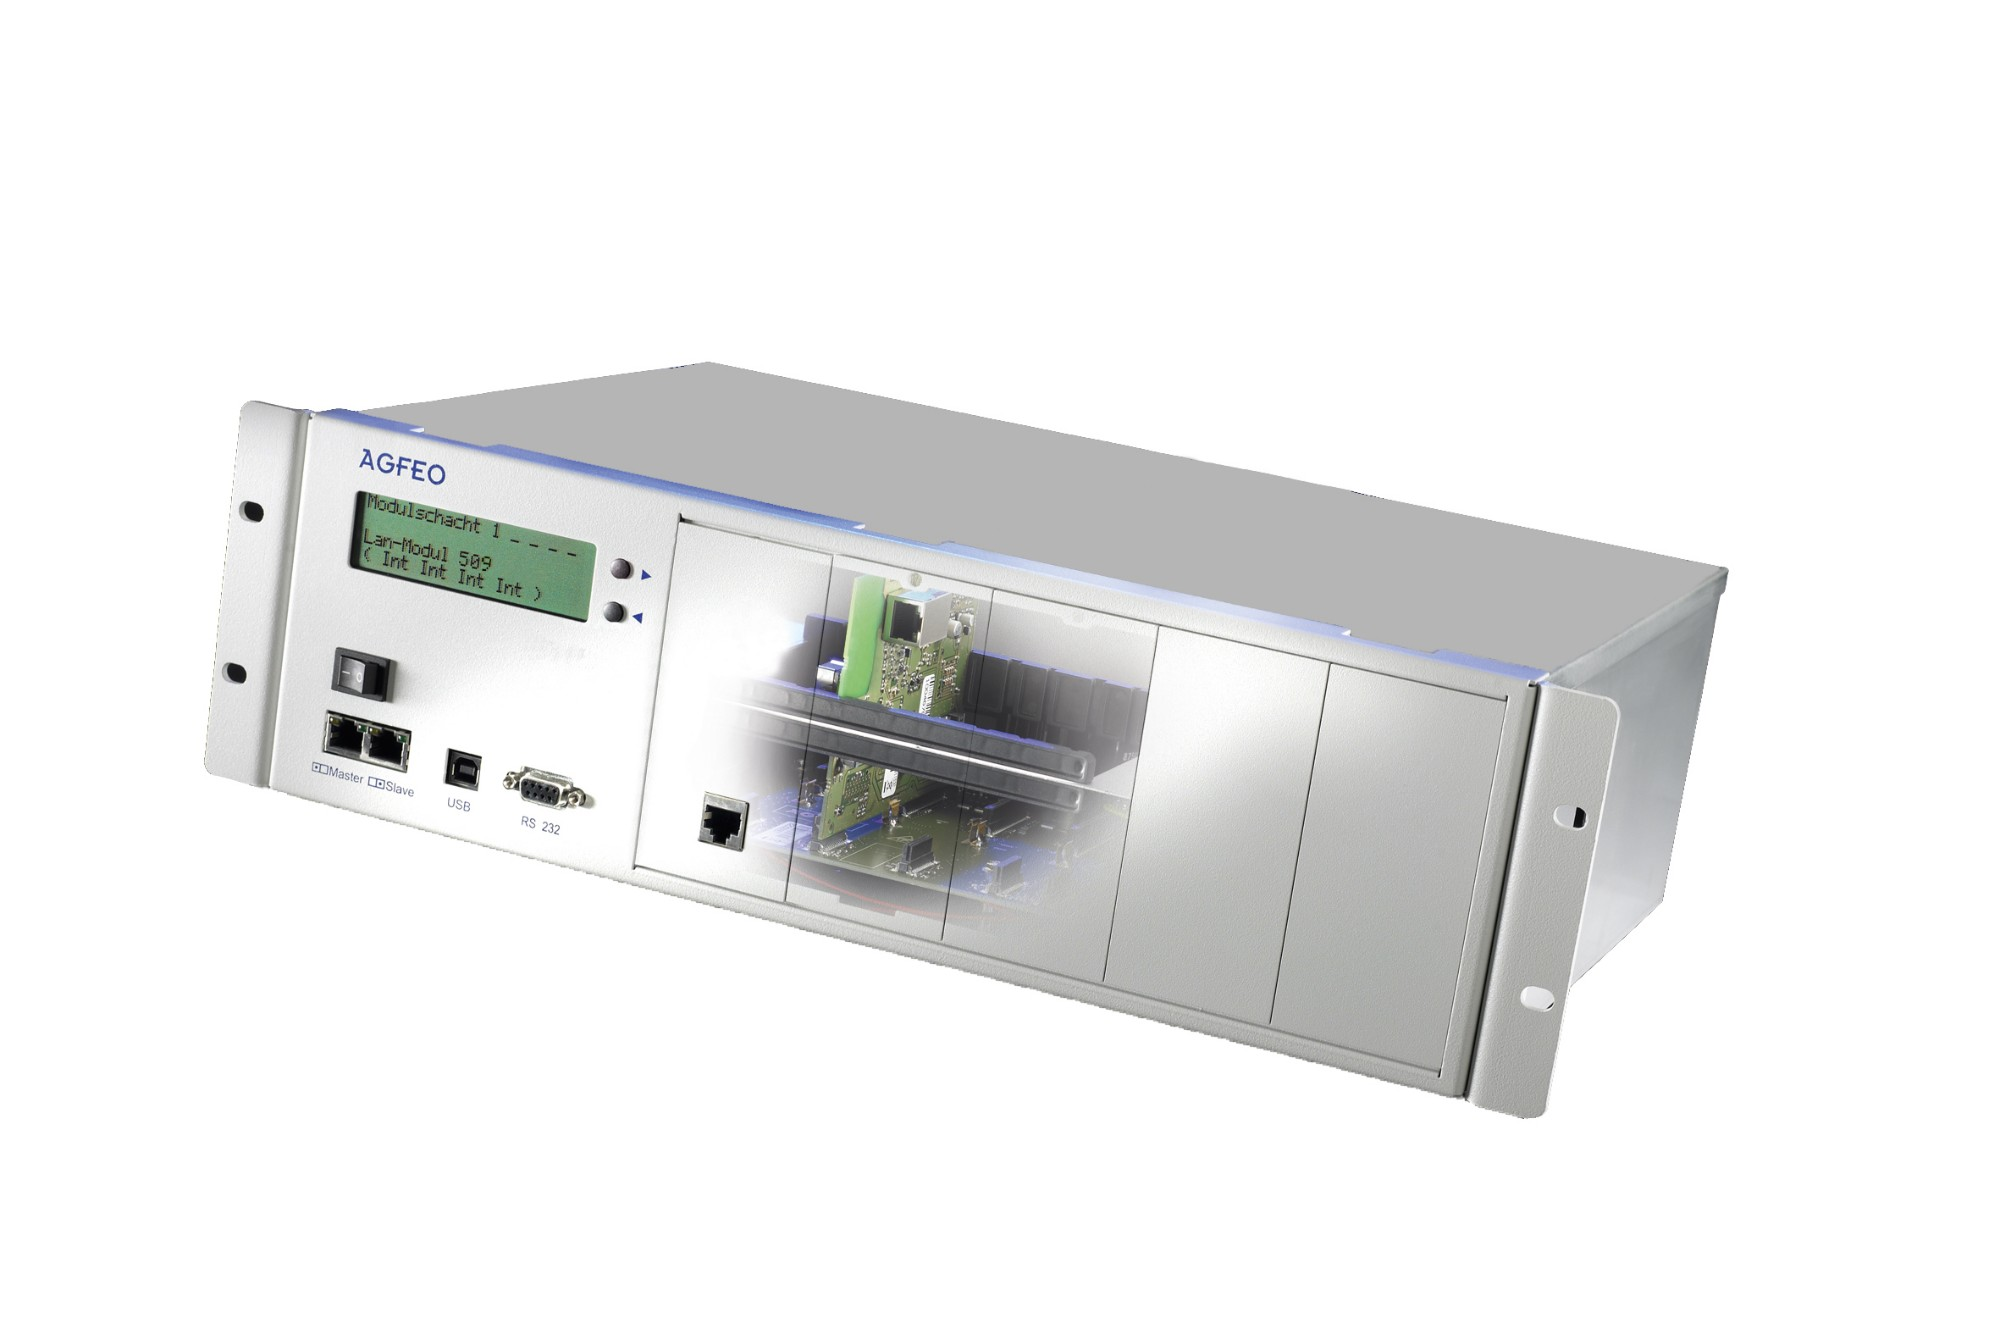 AGFEO AS 200 LAN II Wired ISDN access device